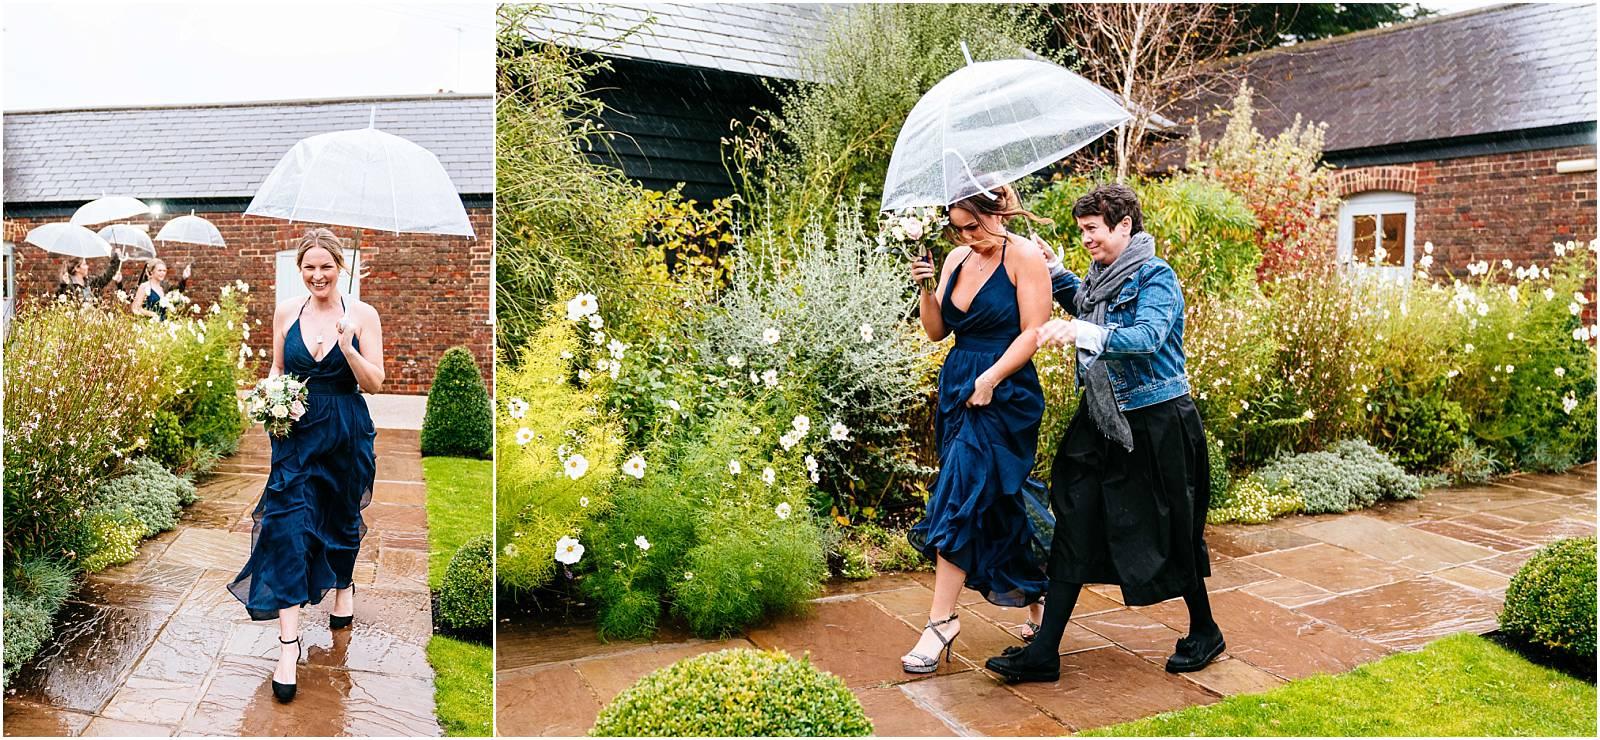 rainy walk to farbridge wedding